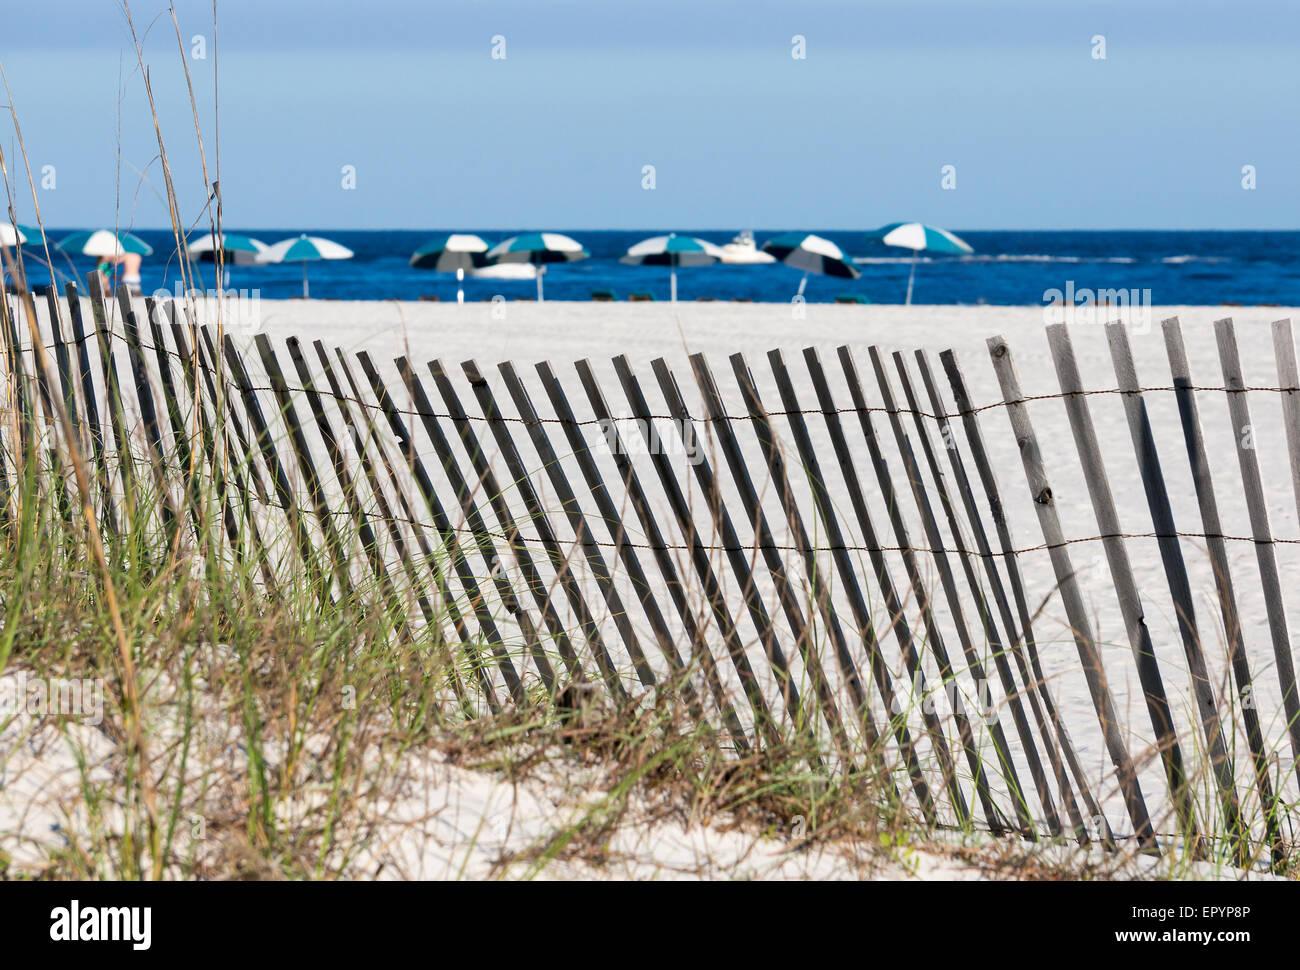 A scene on the Alabama Gulf Coast. - Stock Image